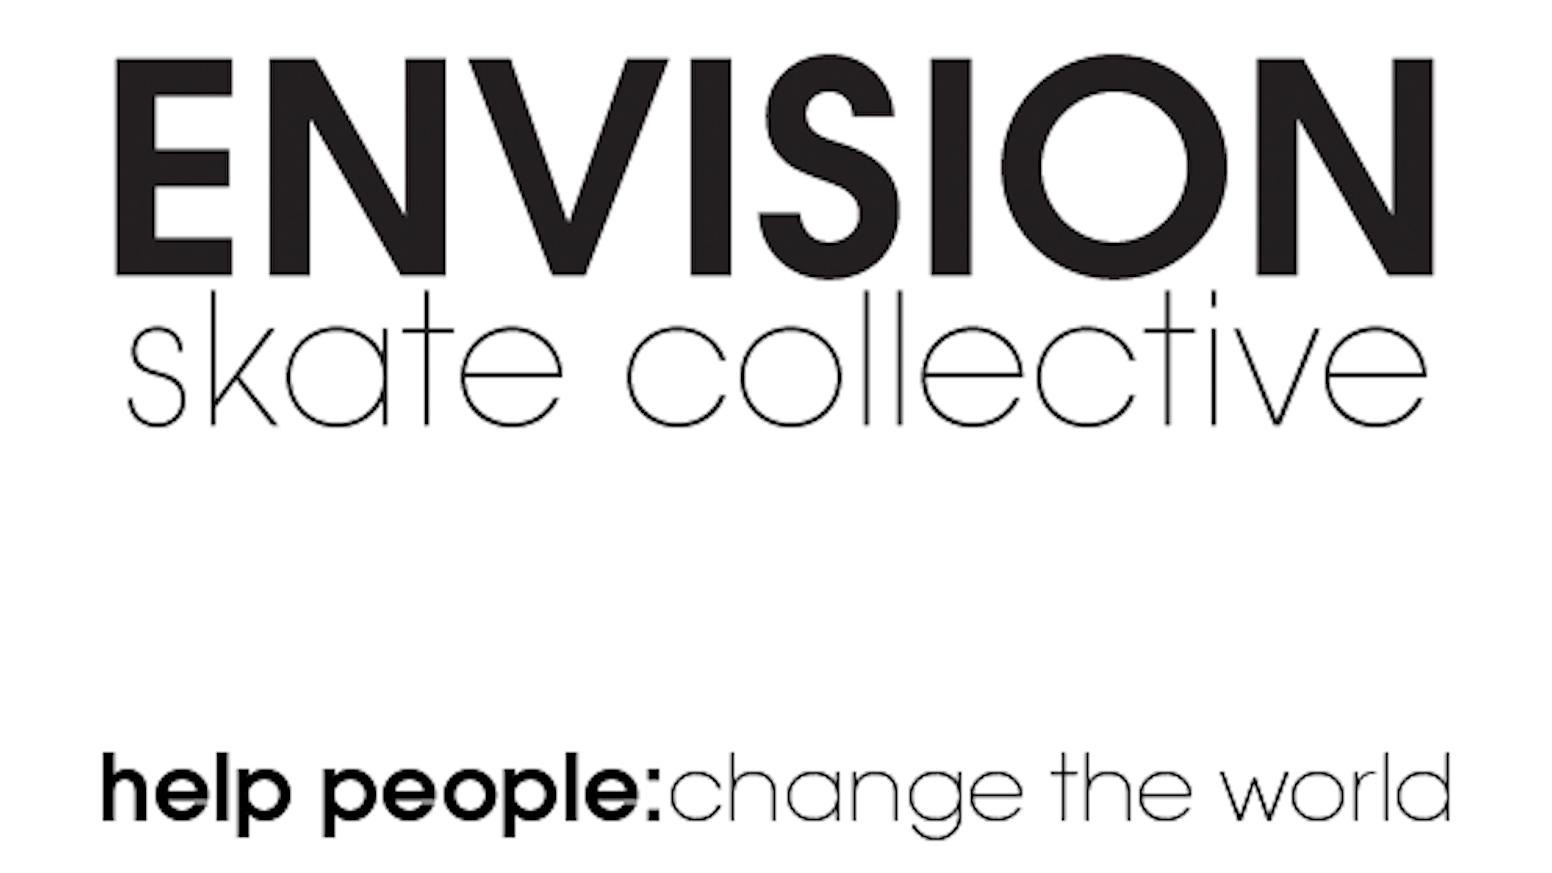 Envision Skate Collective by Peter Metzger — Kickstarter